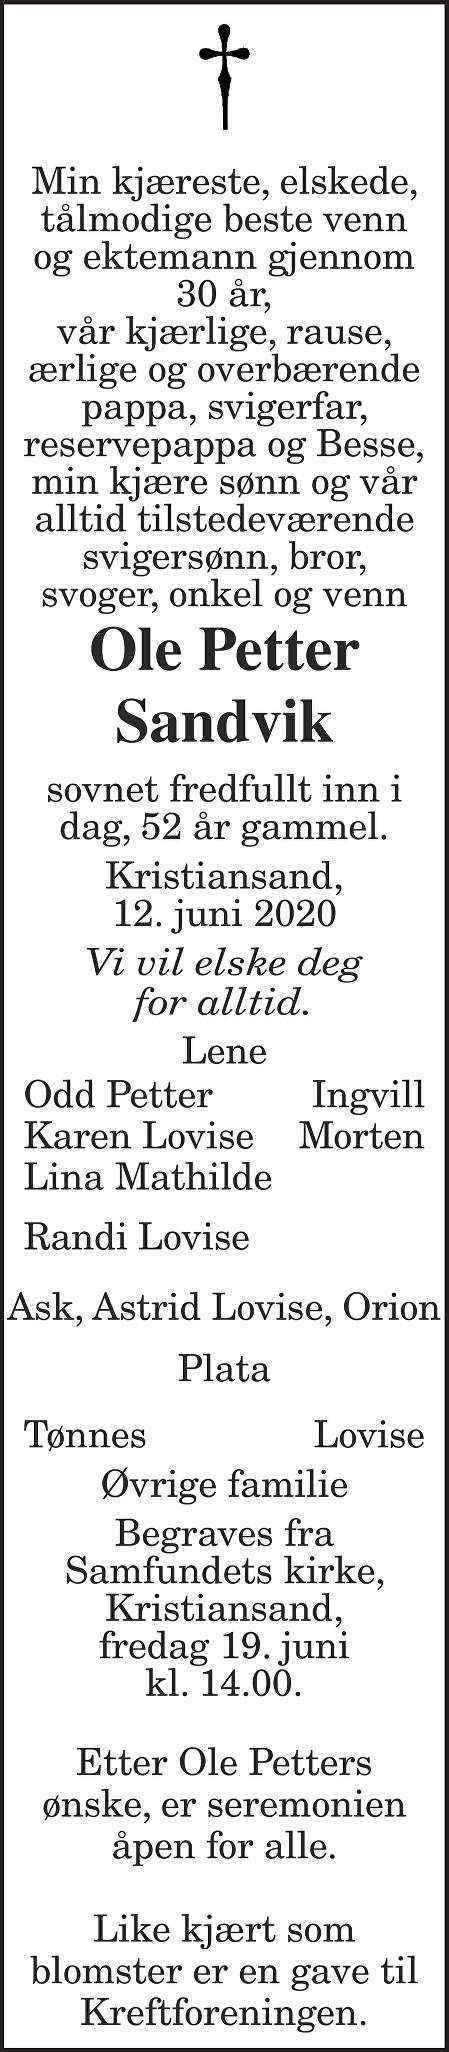 Ole Petter Sandvik Dødsannonse